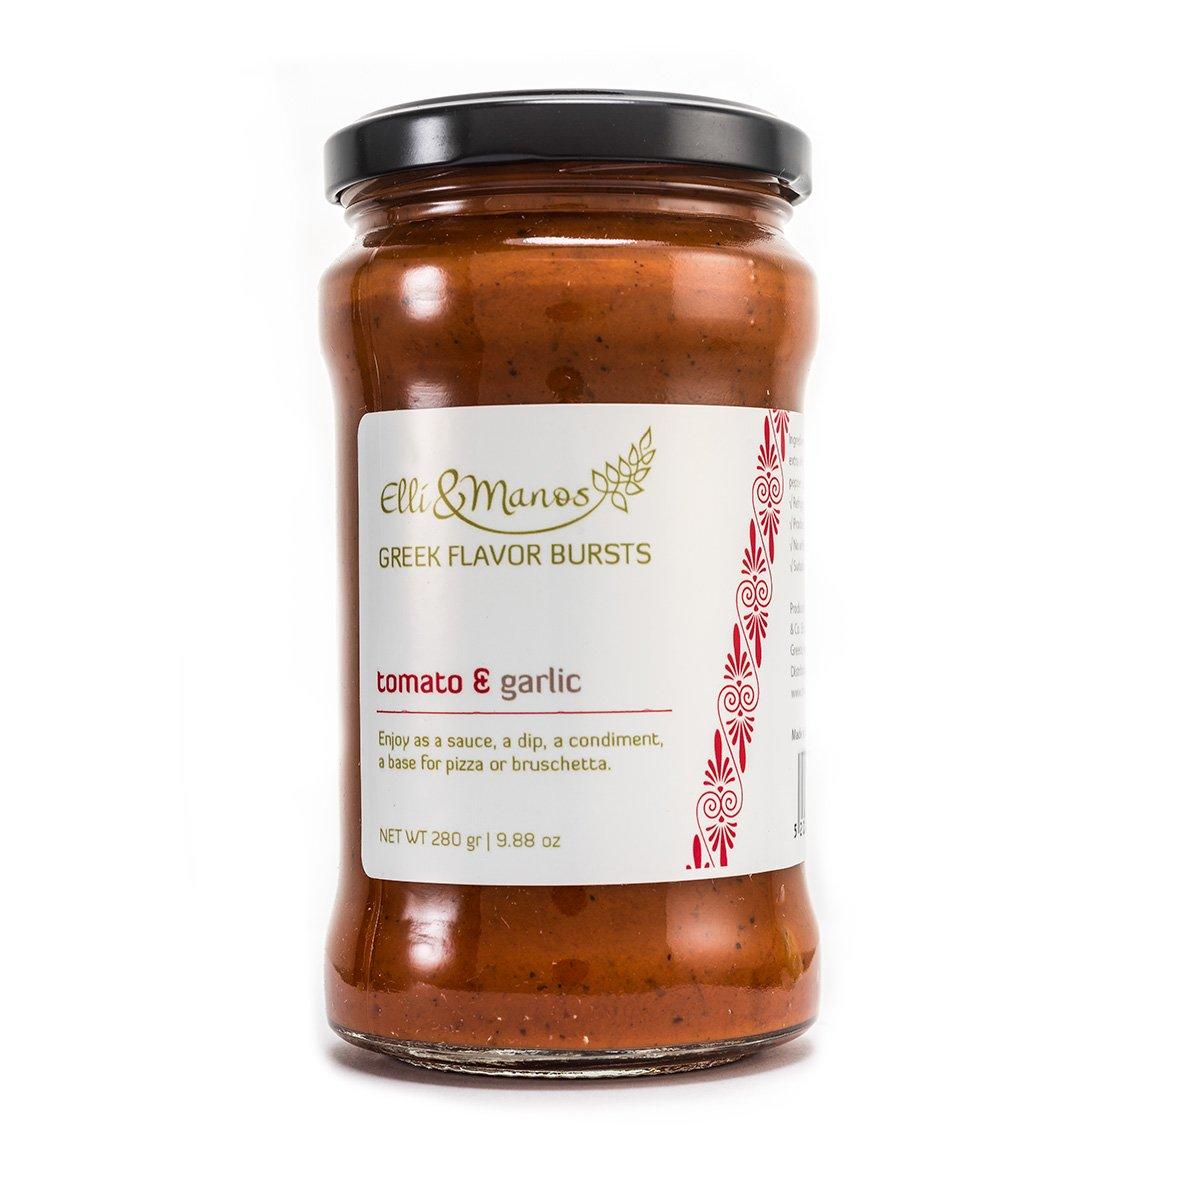 Elli & Manos Greek Flavor Bursts - Tomato & Garlic - 280gr/9.88oz - highly concentrated spread/veggie dip by Elli & Manos